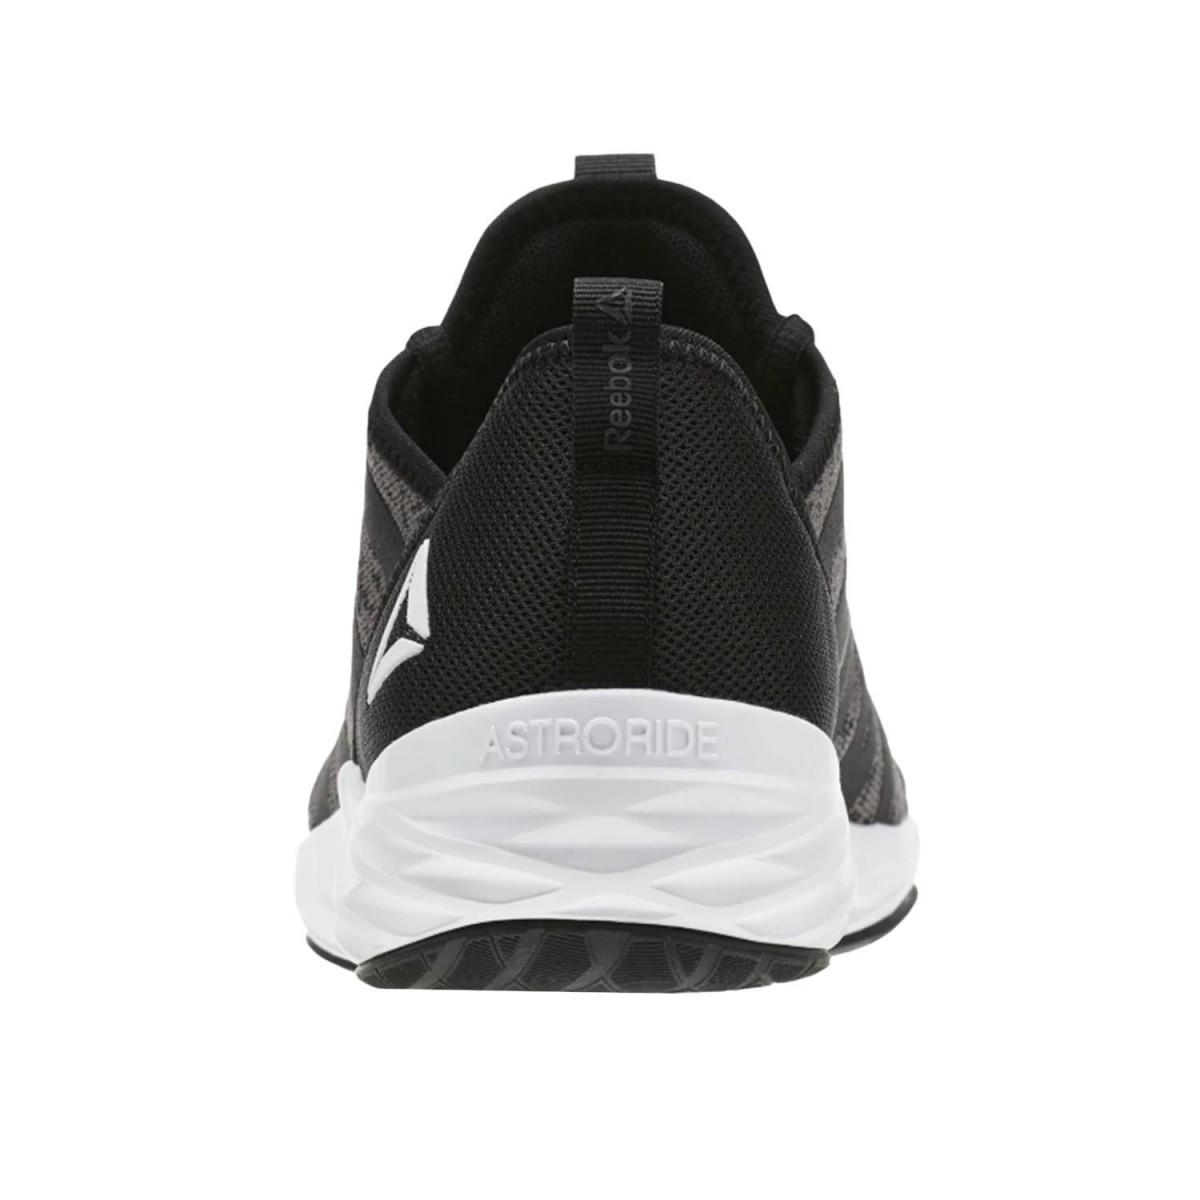 eb0c57621437d Zapatillas Reebok Astroride Future Sport - Running - Zapatillas - Hombre